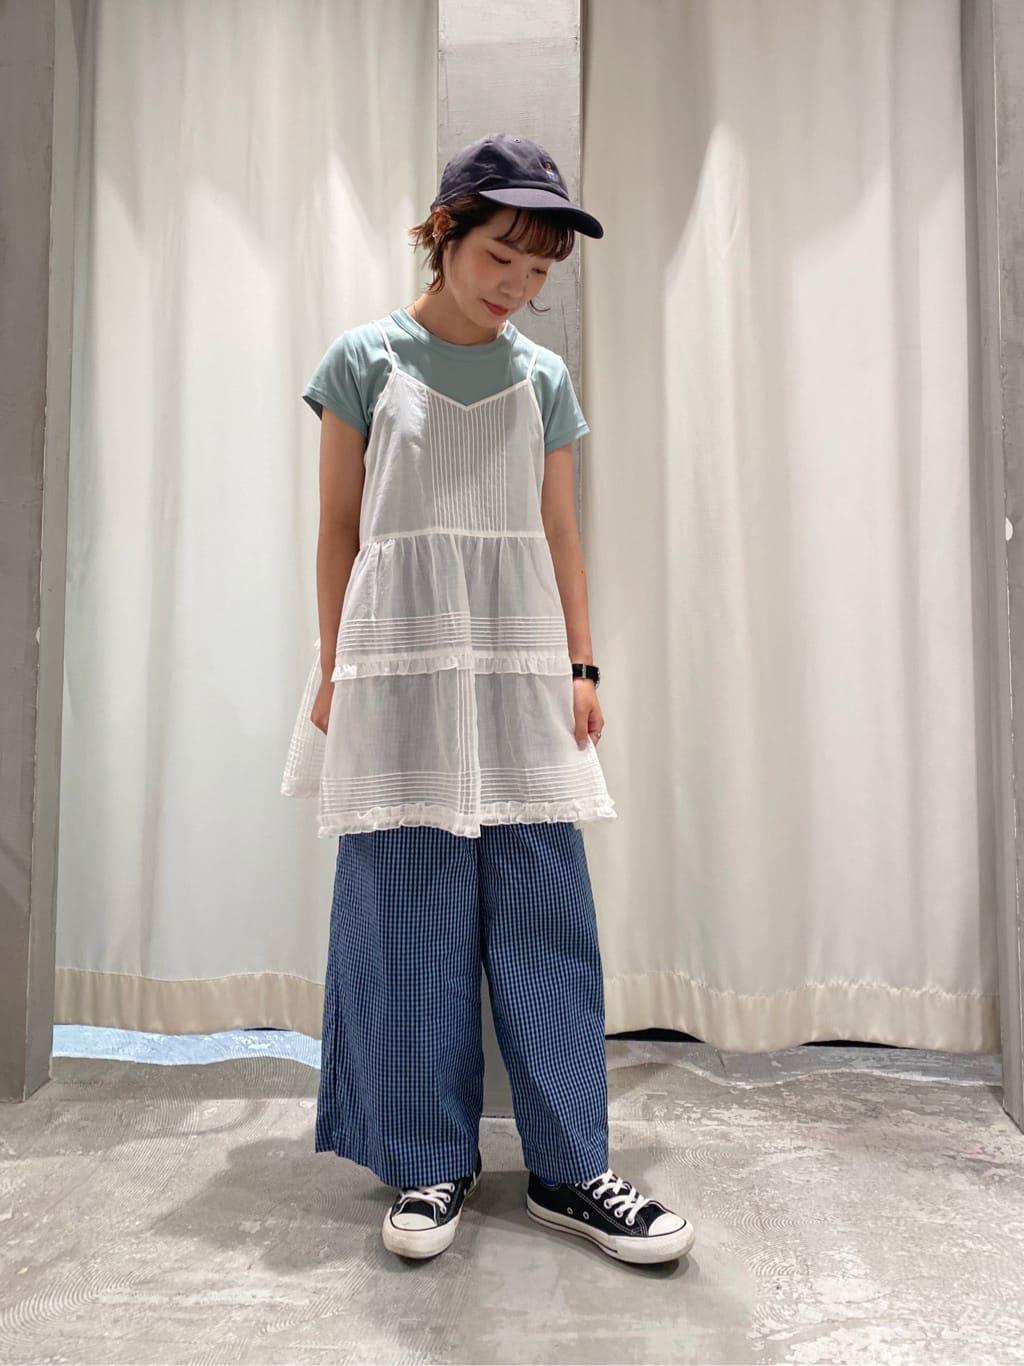 - CHILD WOMAN CHILD WOMAN , PAR ICI ルミネ横浜 身長:153cm 2021.08.12